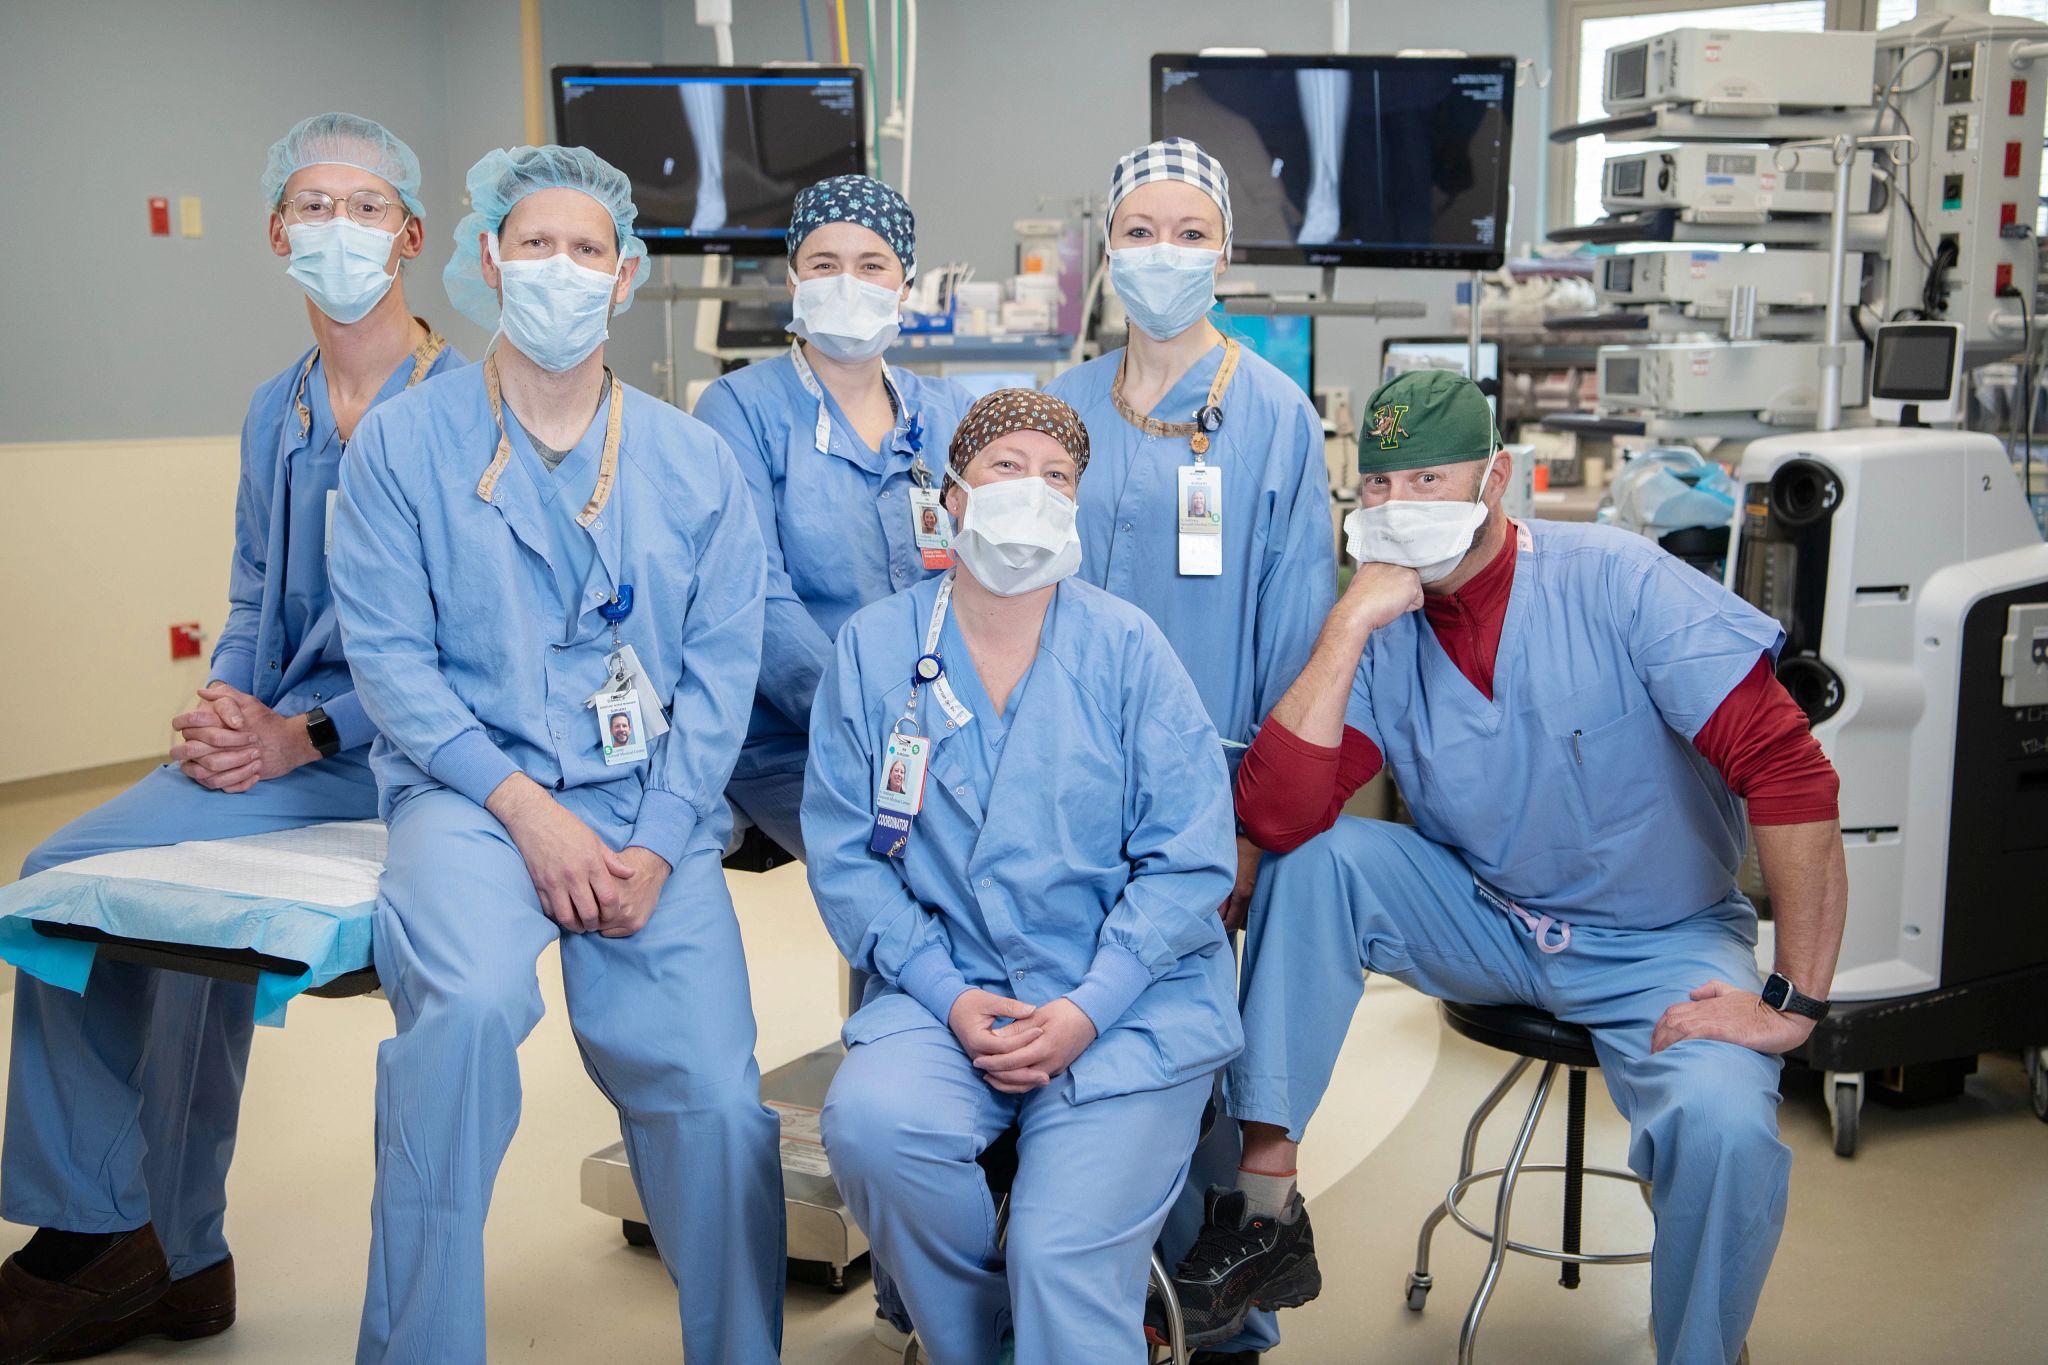 OR team St. Anthony Summit Hospital